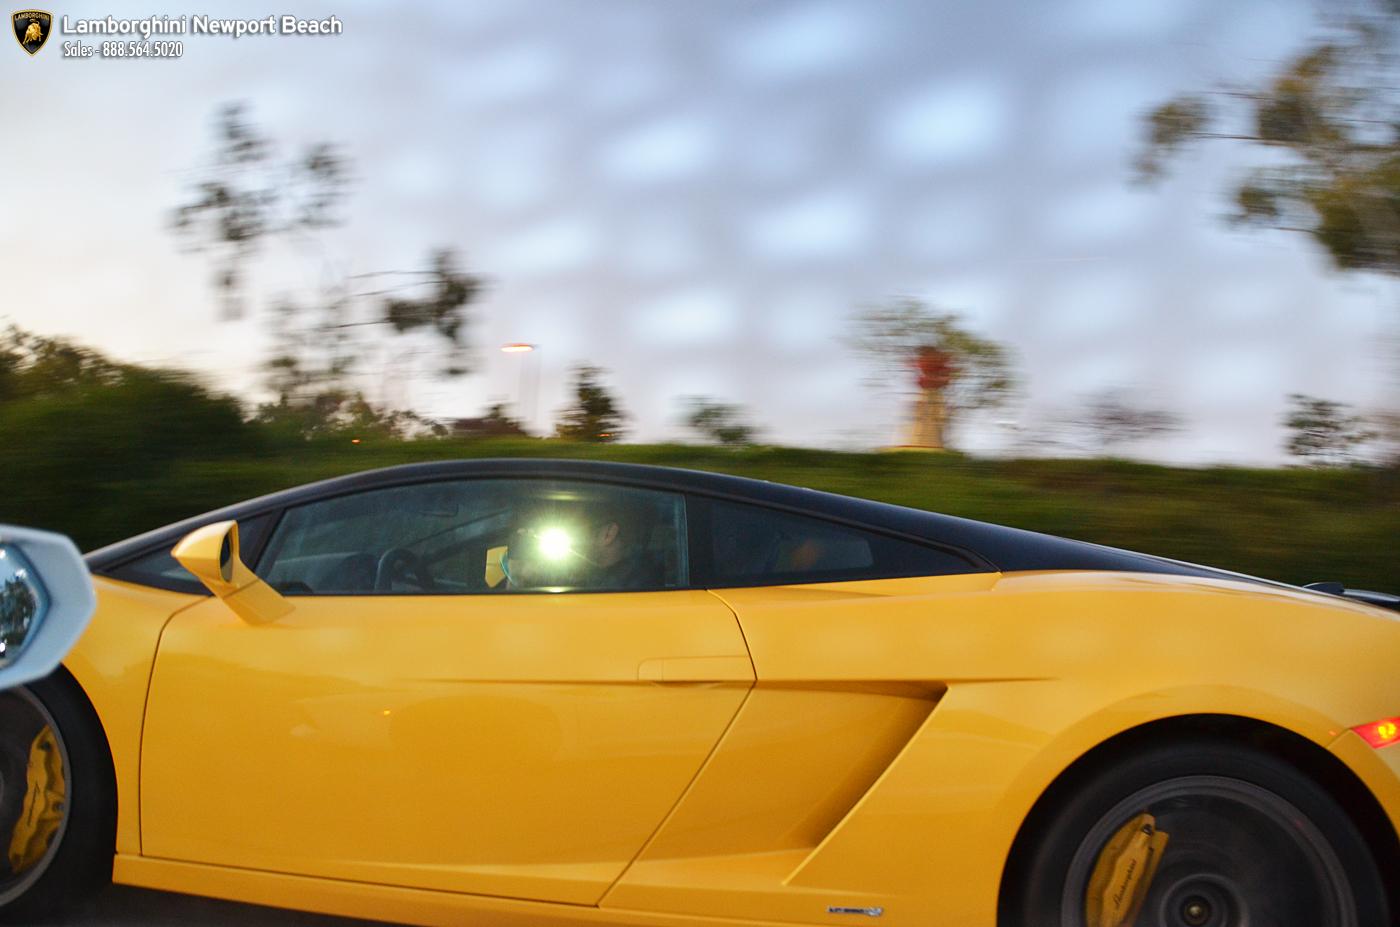 Lamborghini Newport Beach Blog Cars Coffee February 18th